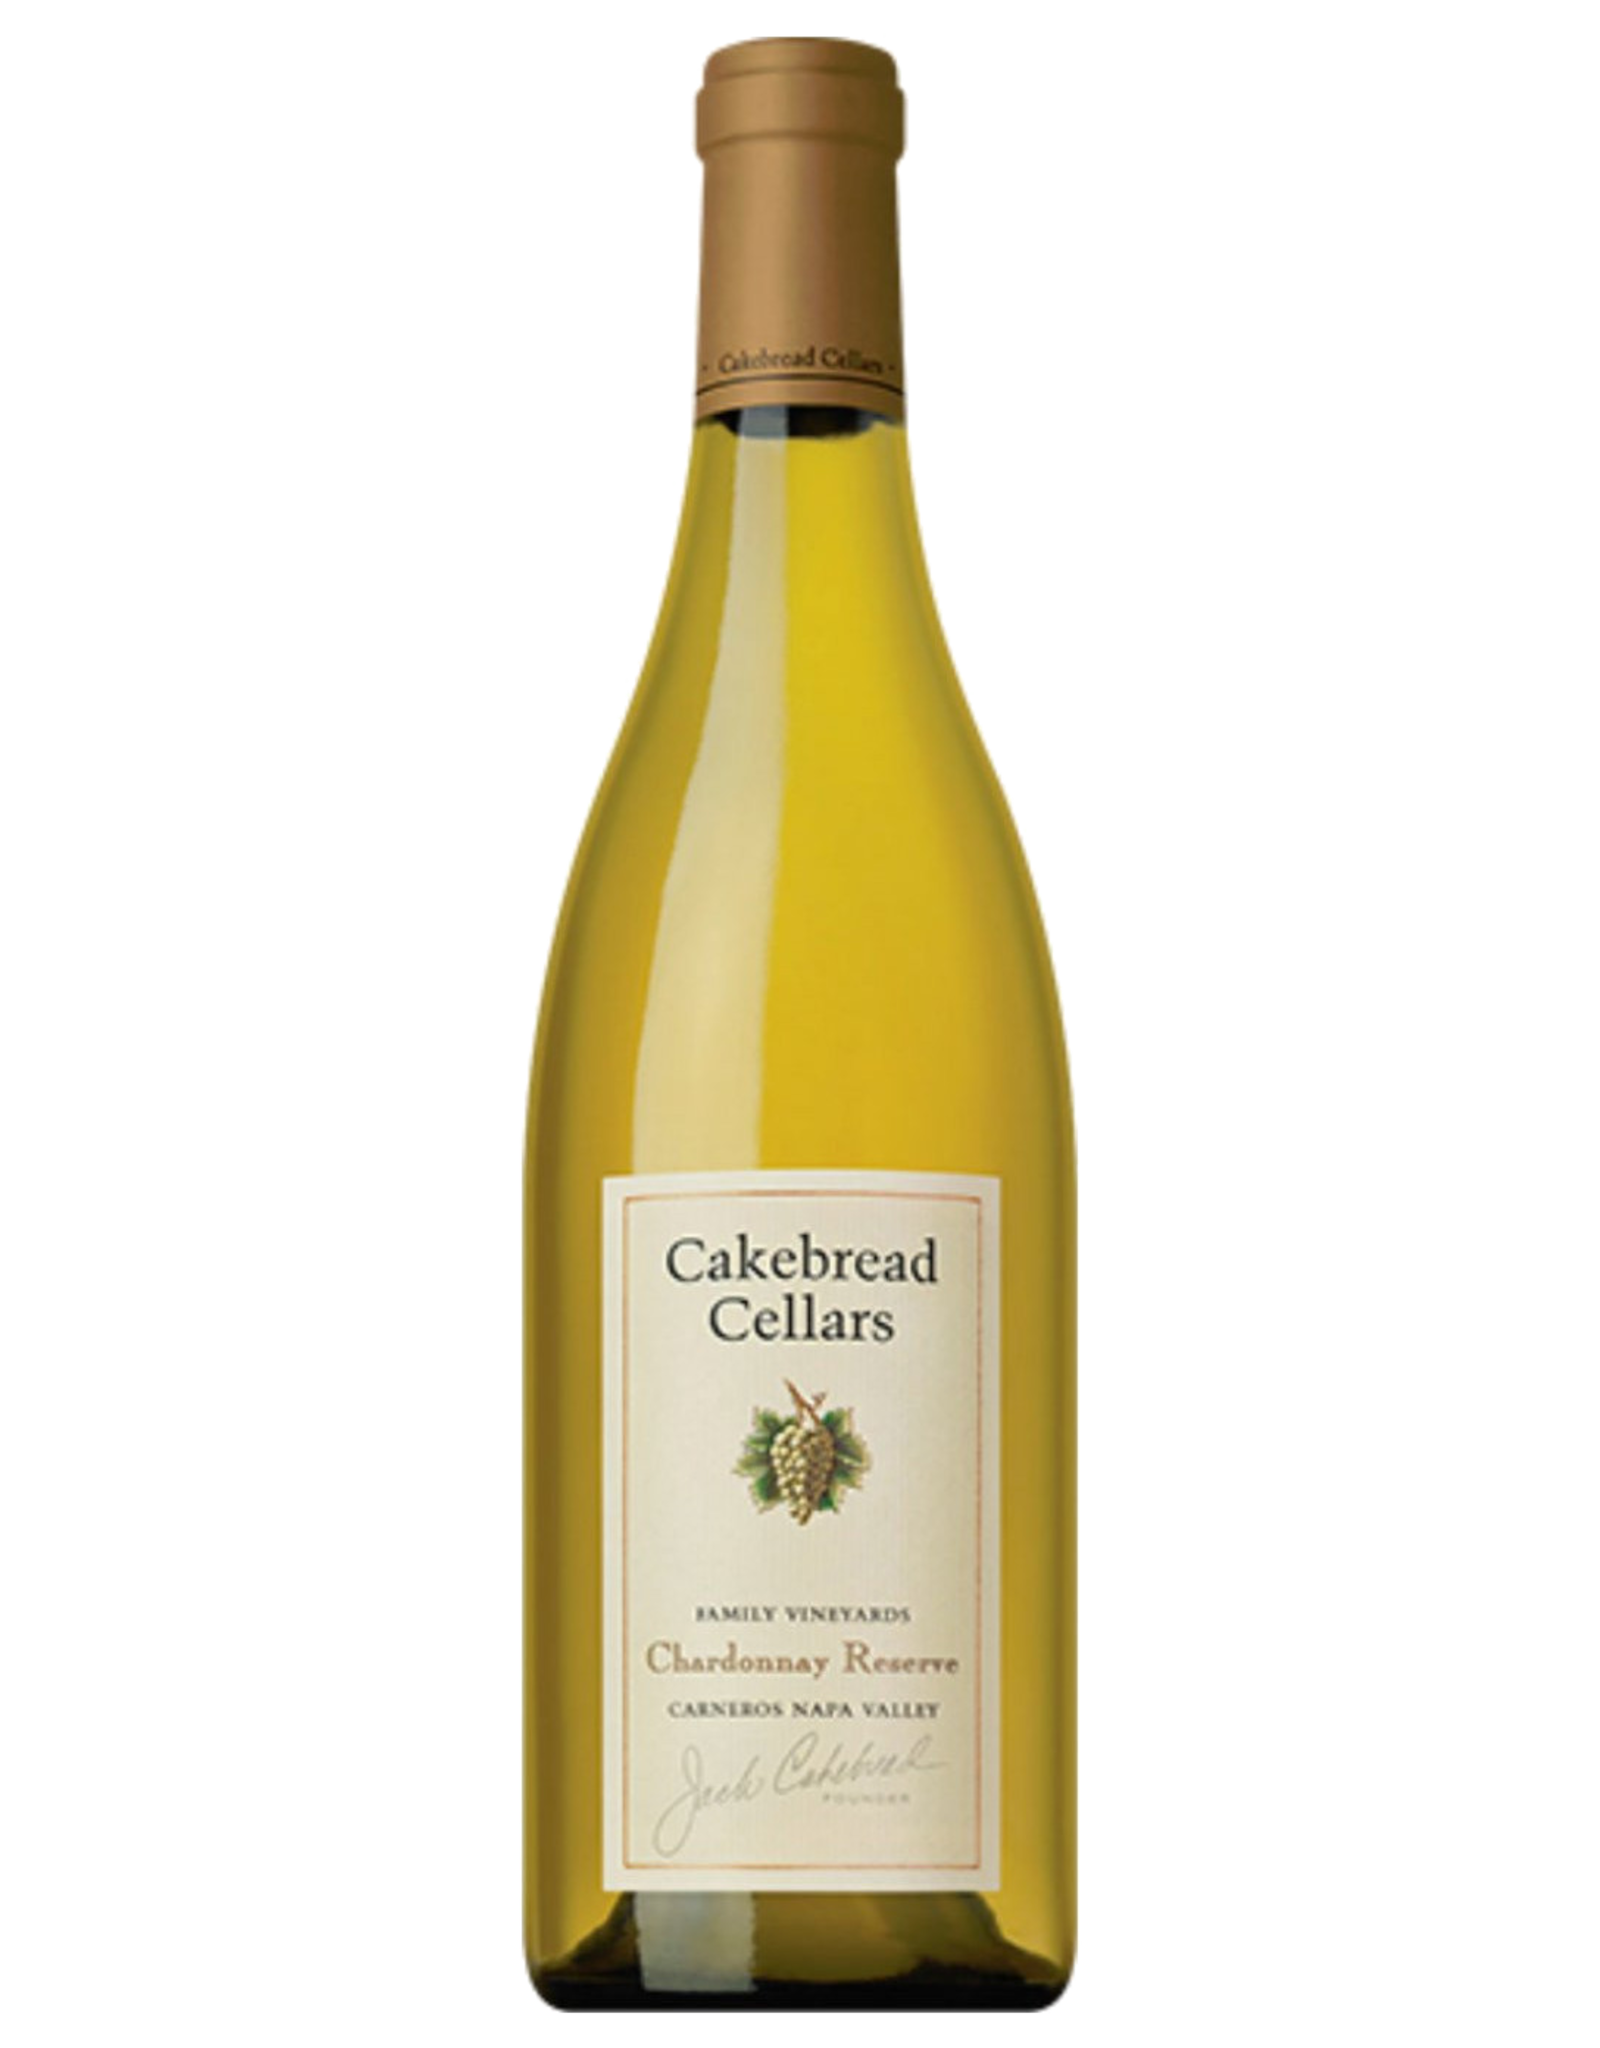 Cakebread Napa Valley Chardonnay Reserve 2014